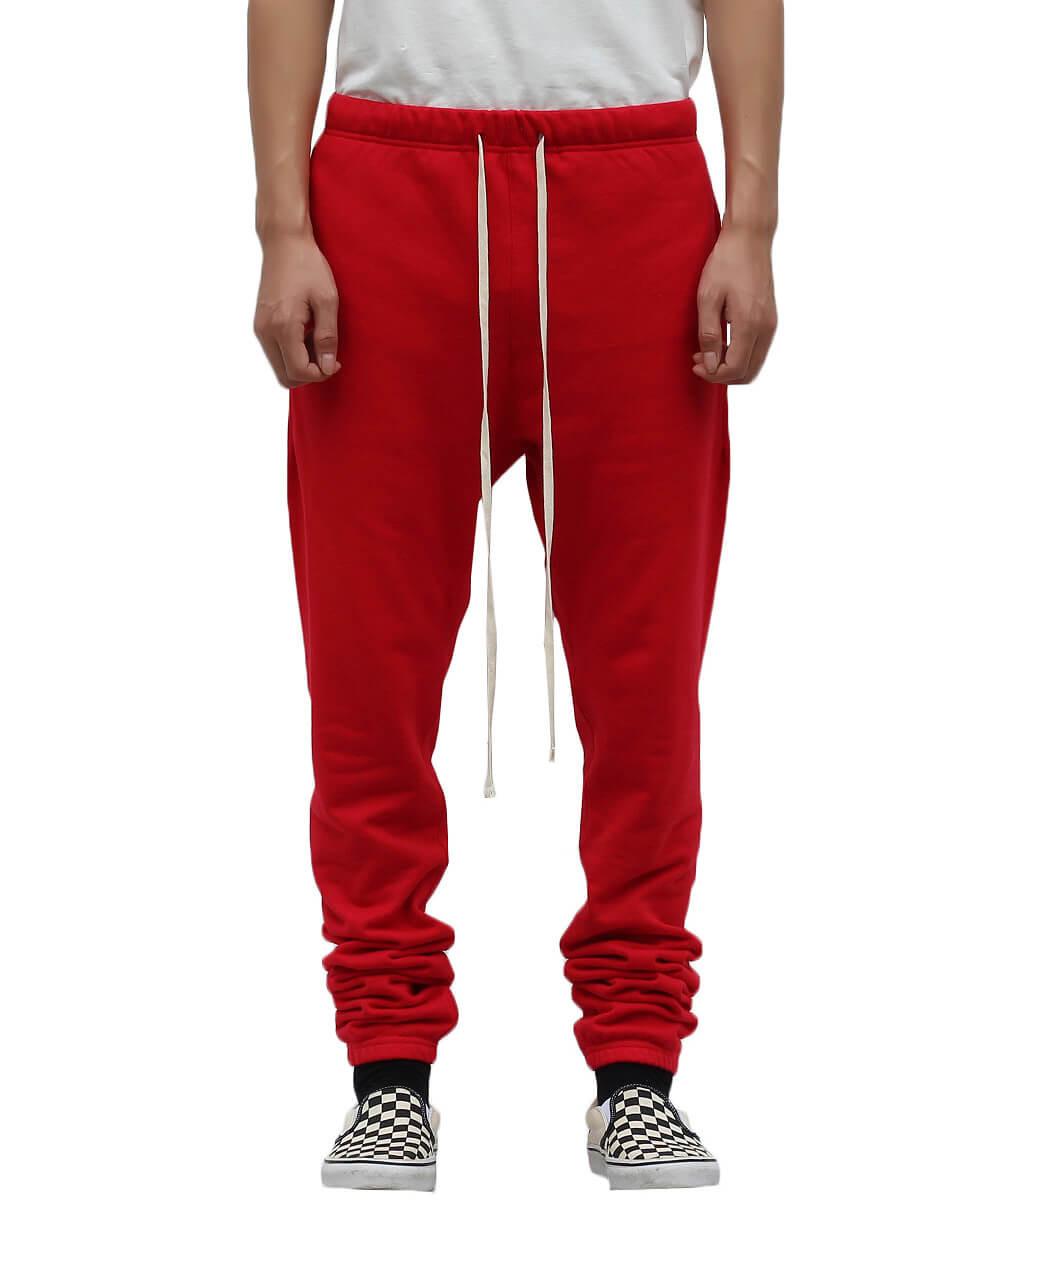 Essential Sweatpants - Red